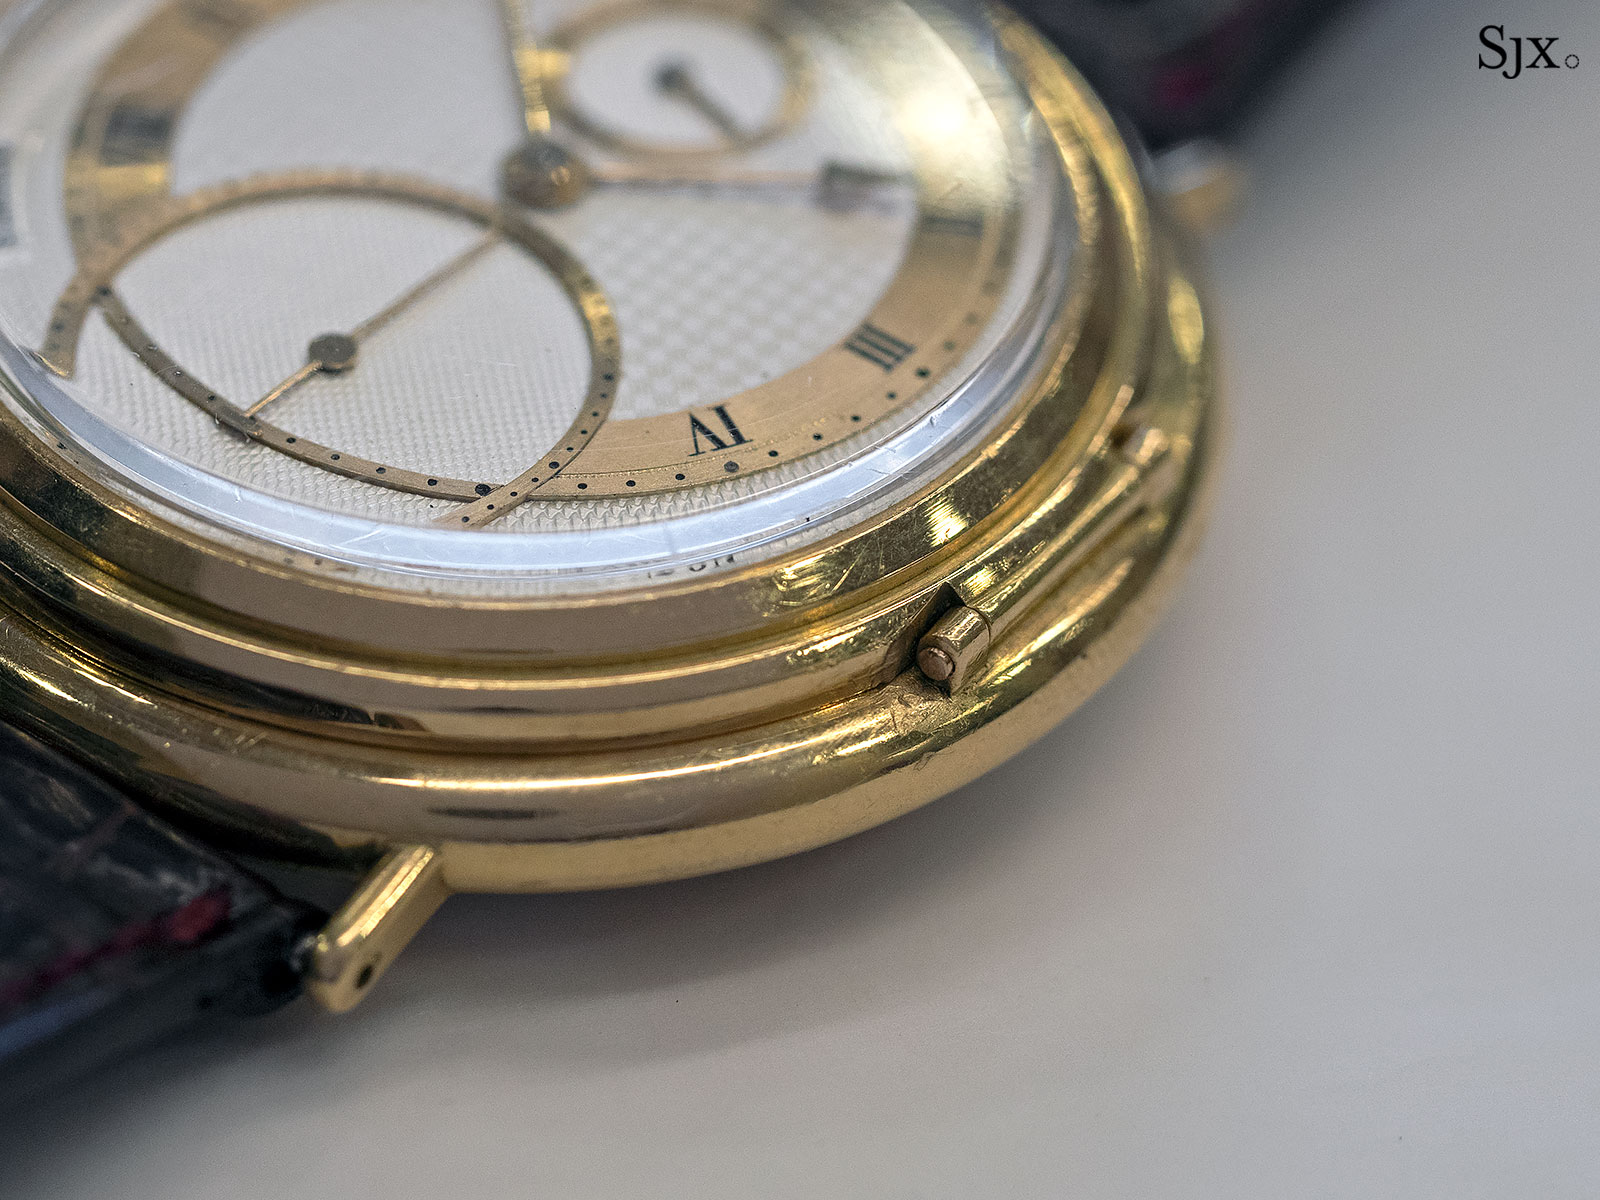 George Daniels Spring Case Tourbillon Wristwatch 2